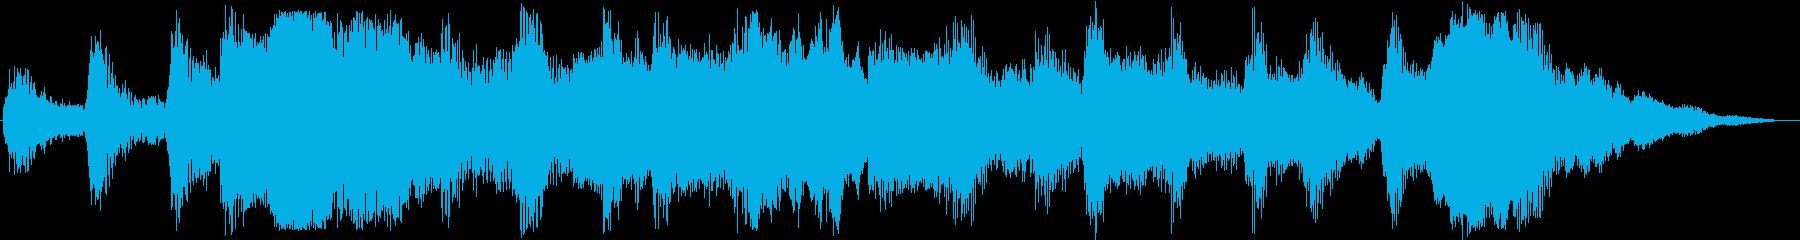 CMの音楽を想定し、IT企業やサービス…の再生済みの波形